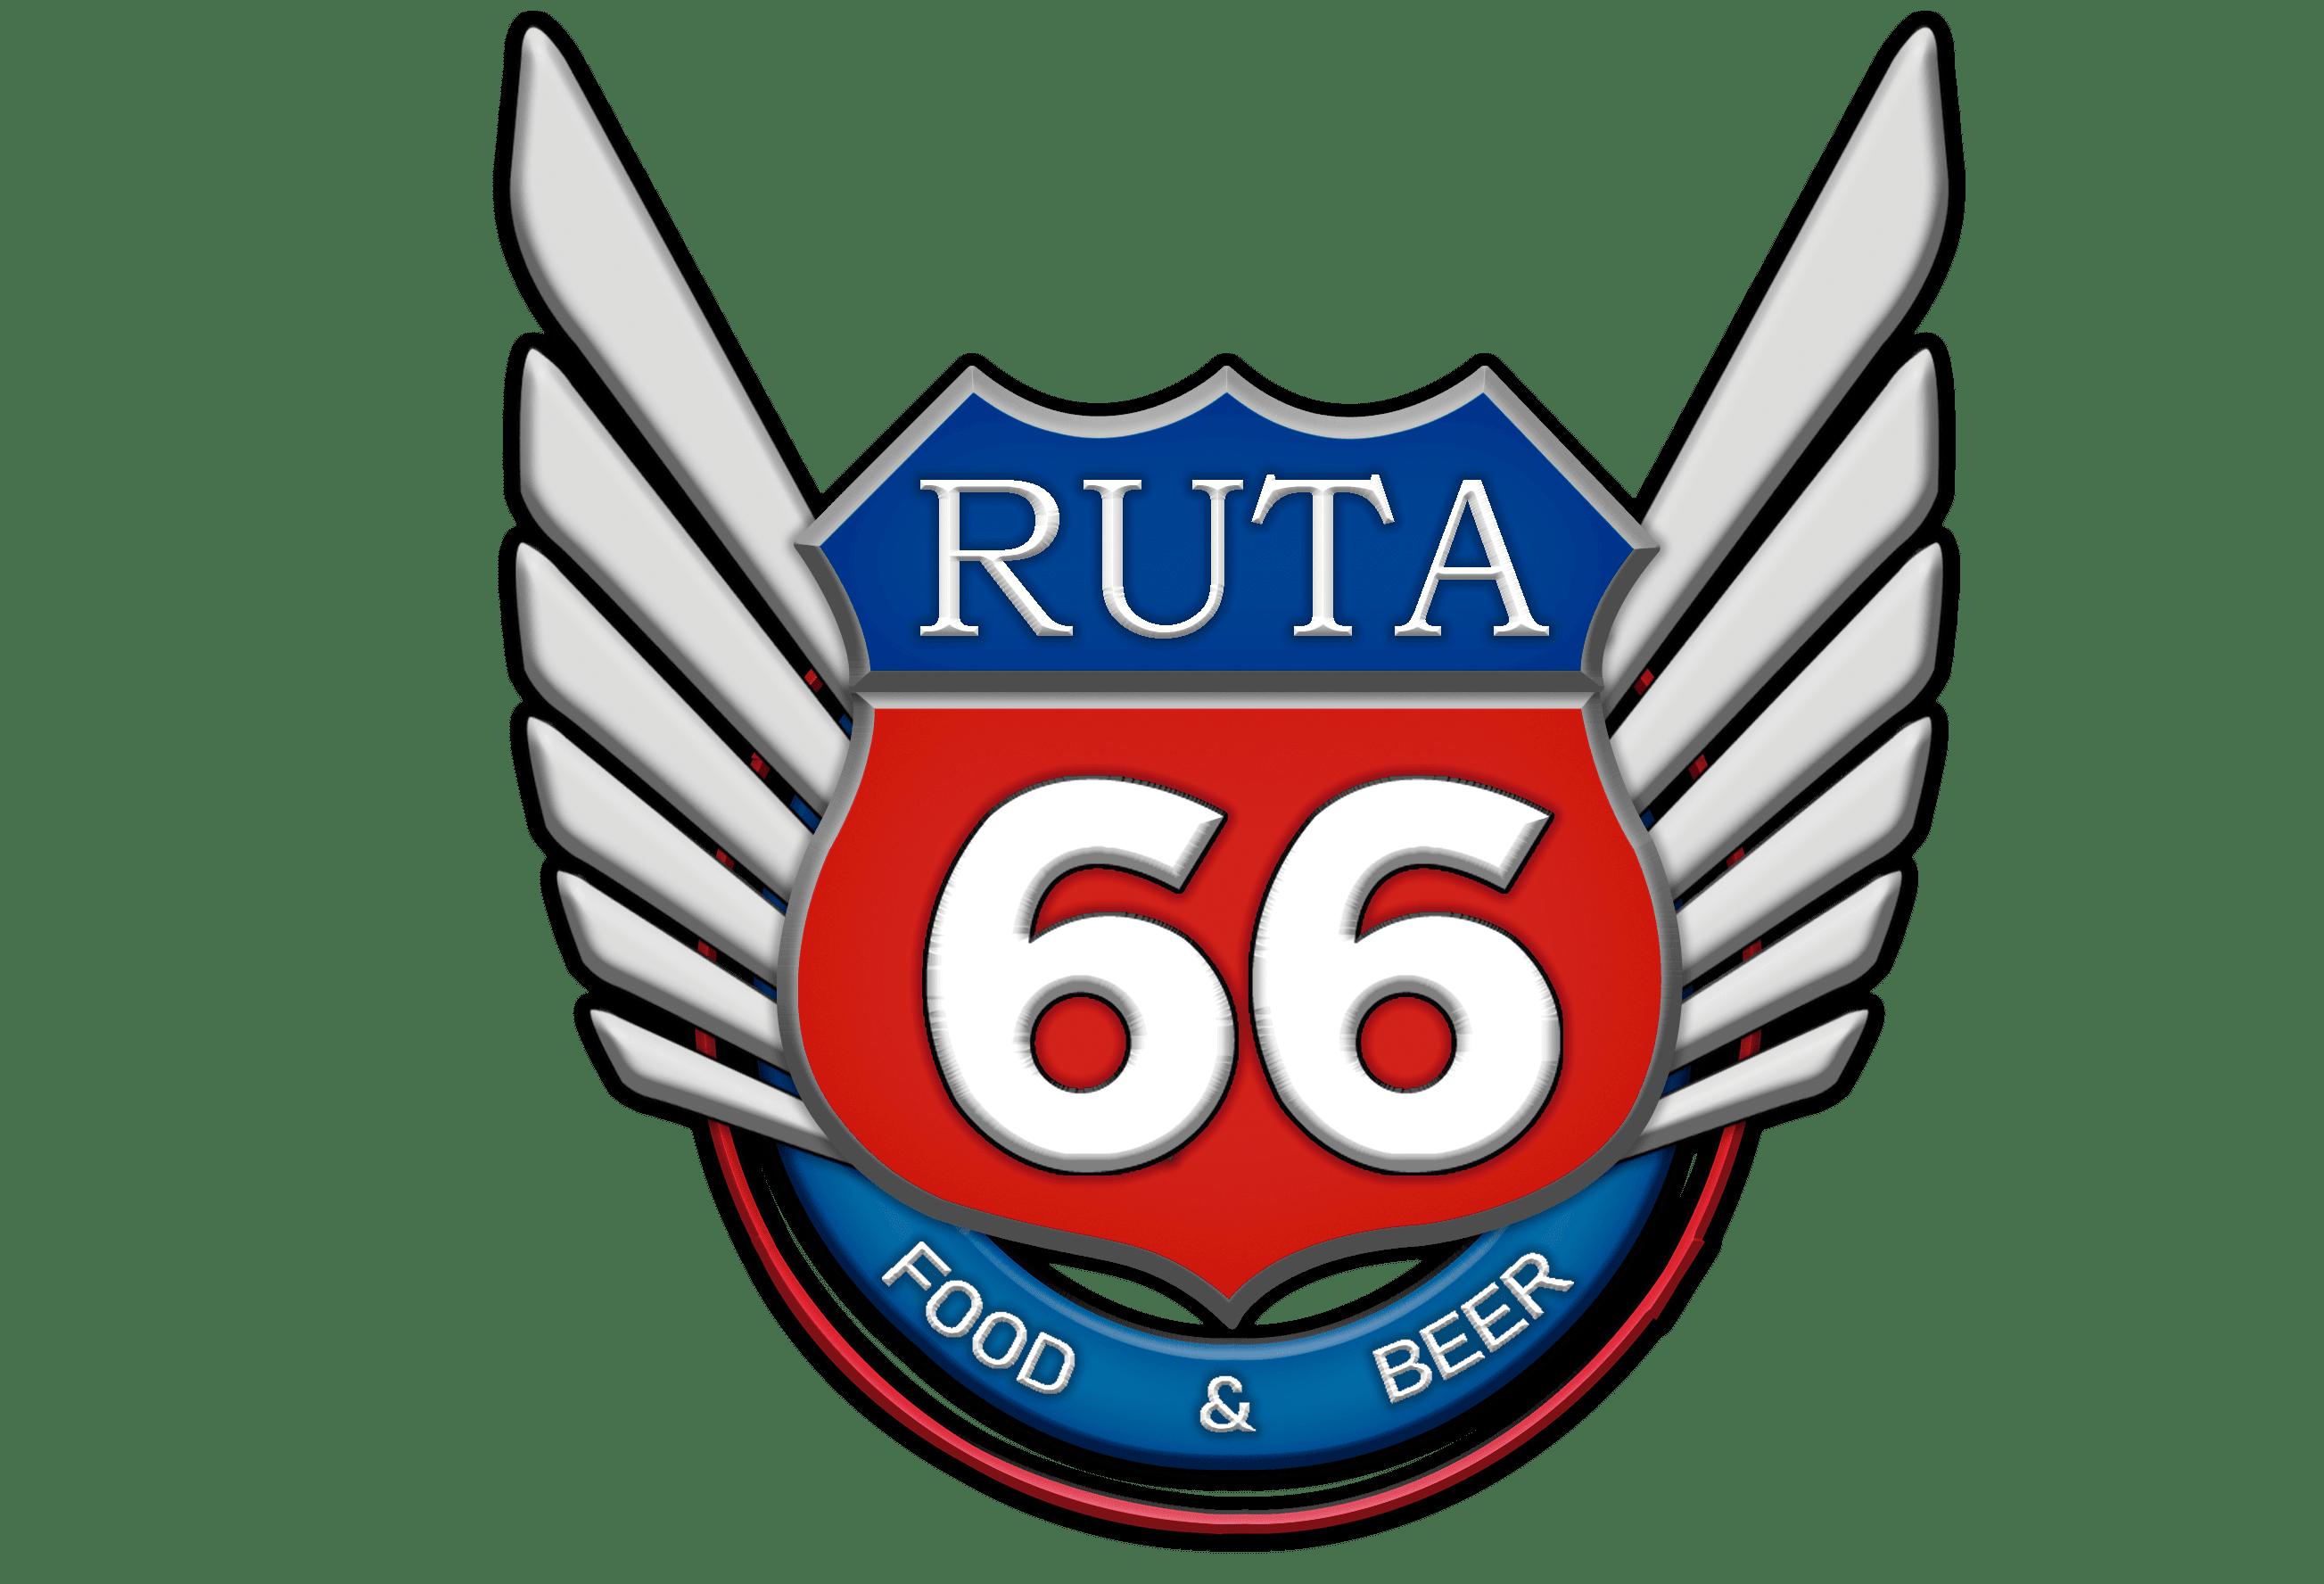 Ruta 66 food and beer